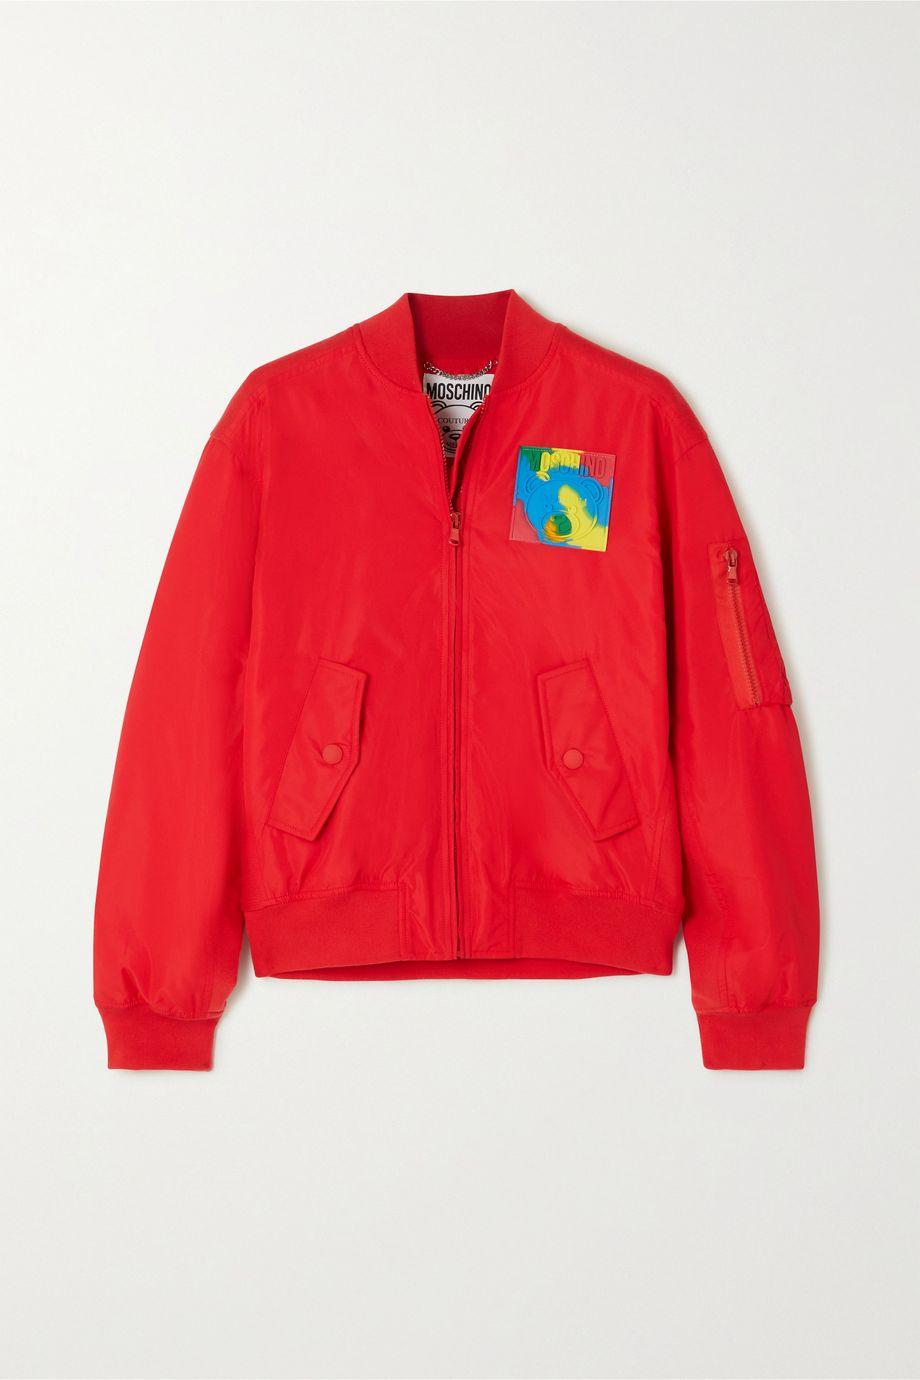 Moschino Appliquéd shell bomber jacket